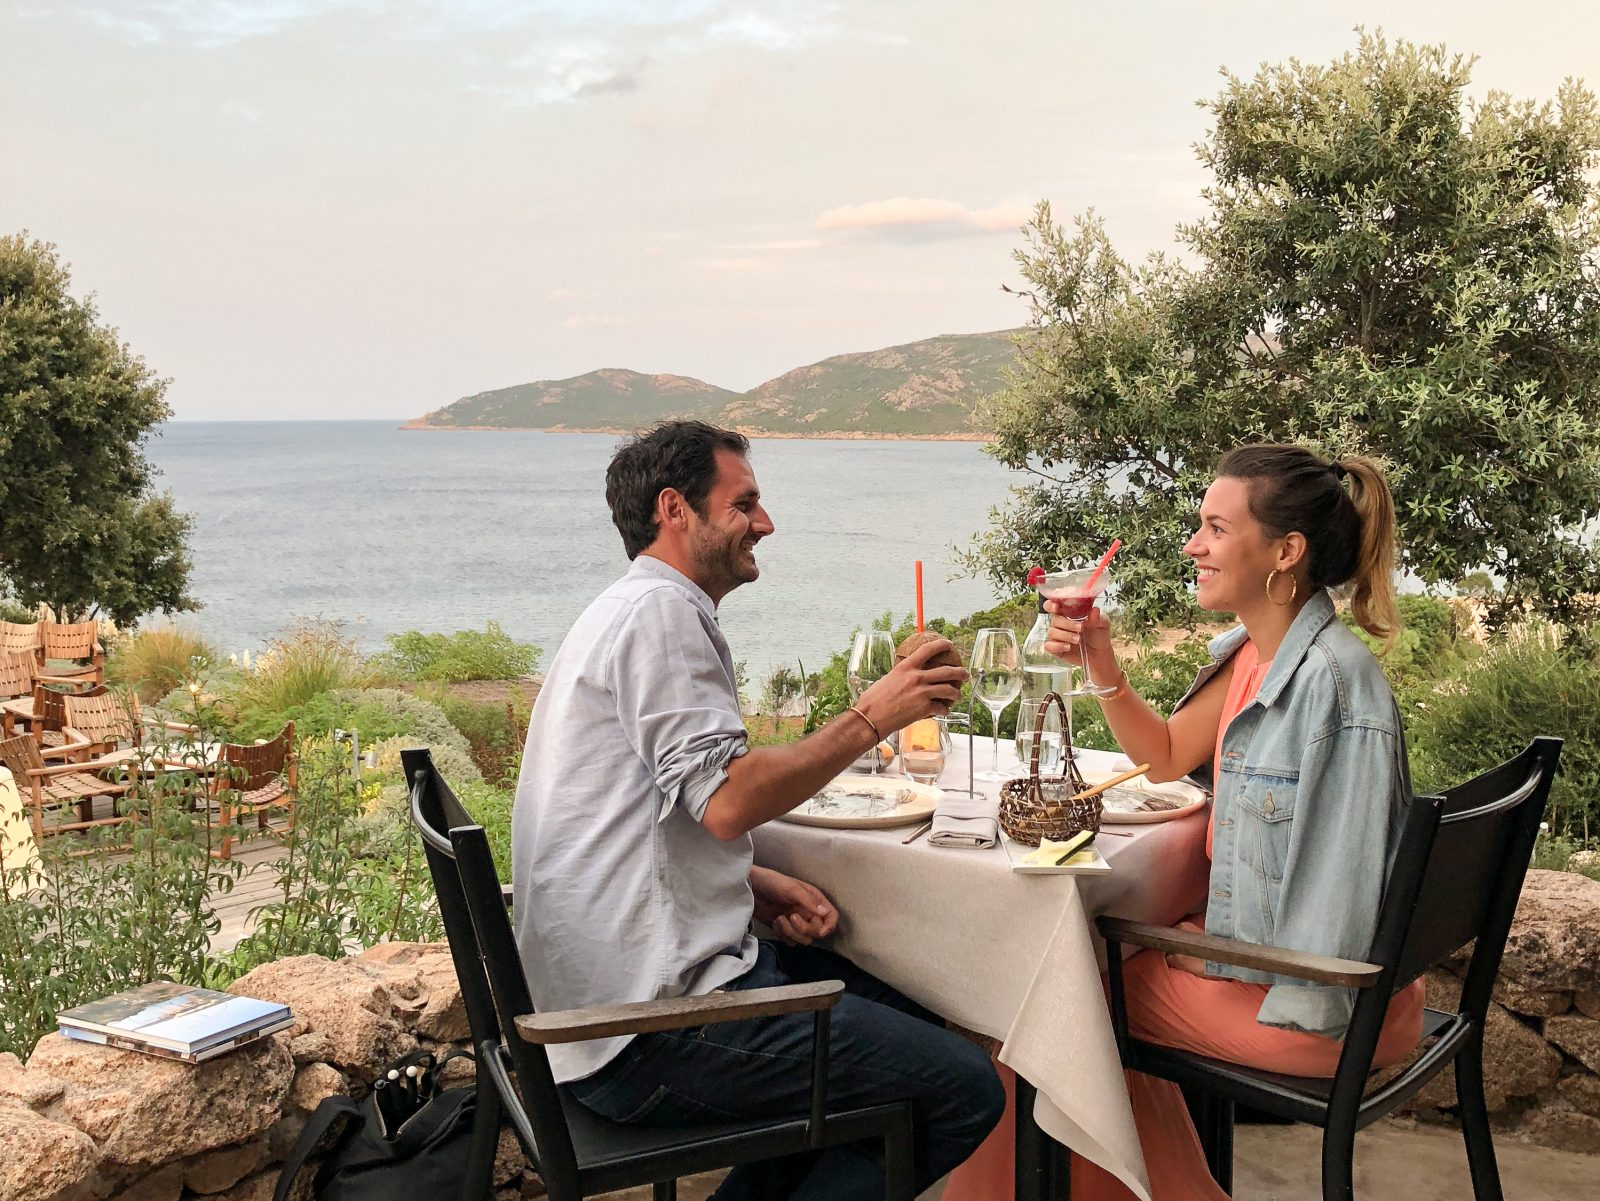 FMR_travelblog-Weekend Bonifacio-Voyage Corse U Capu Biancu 3